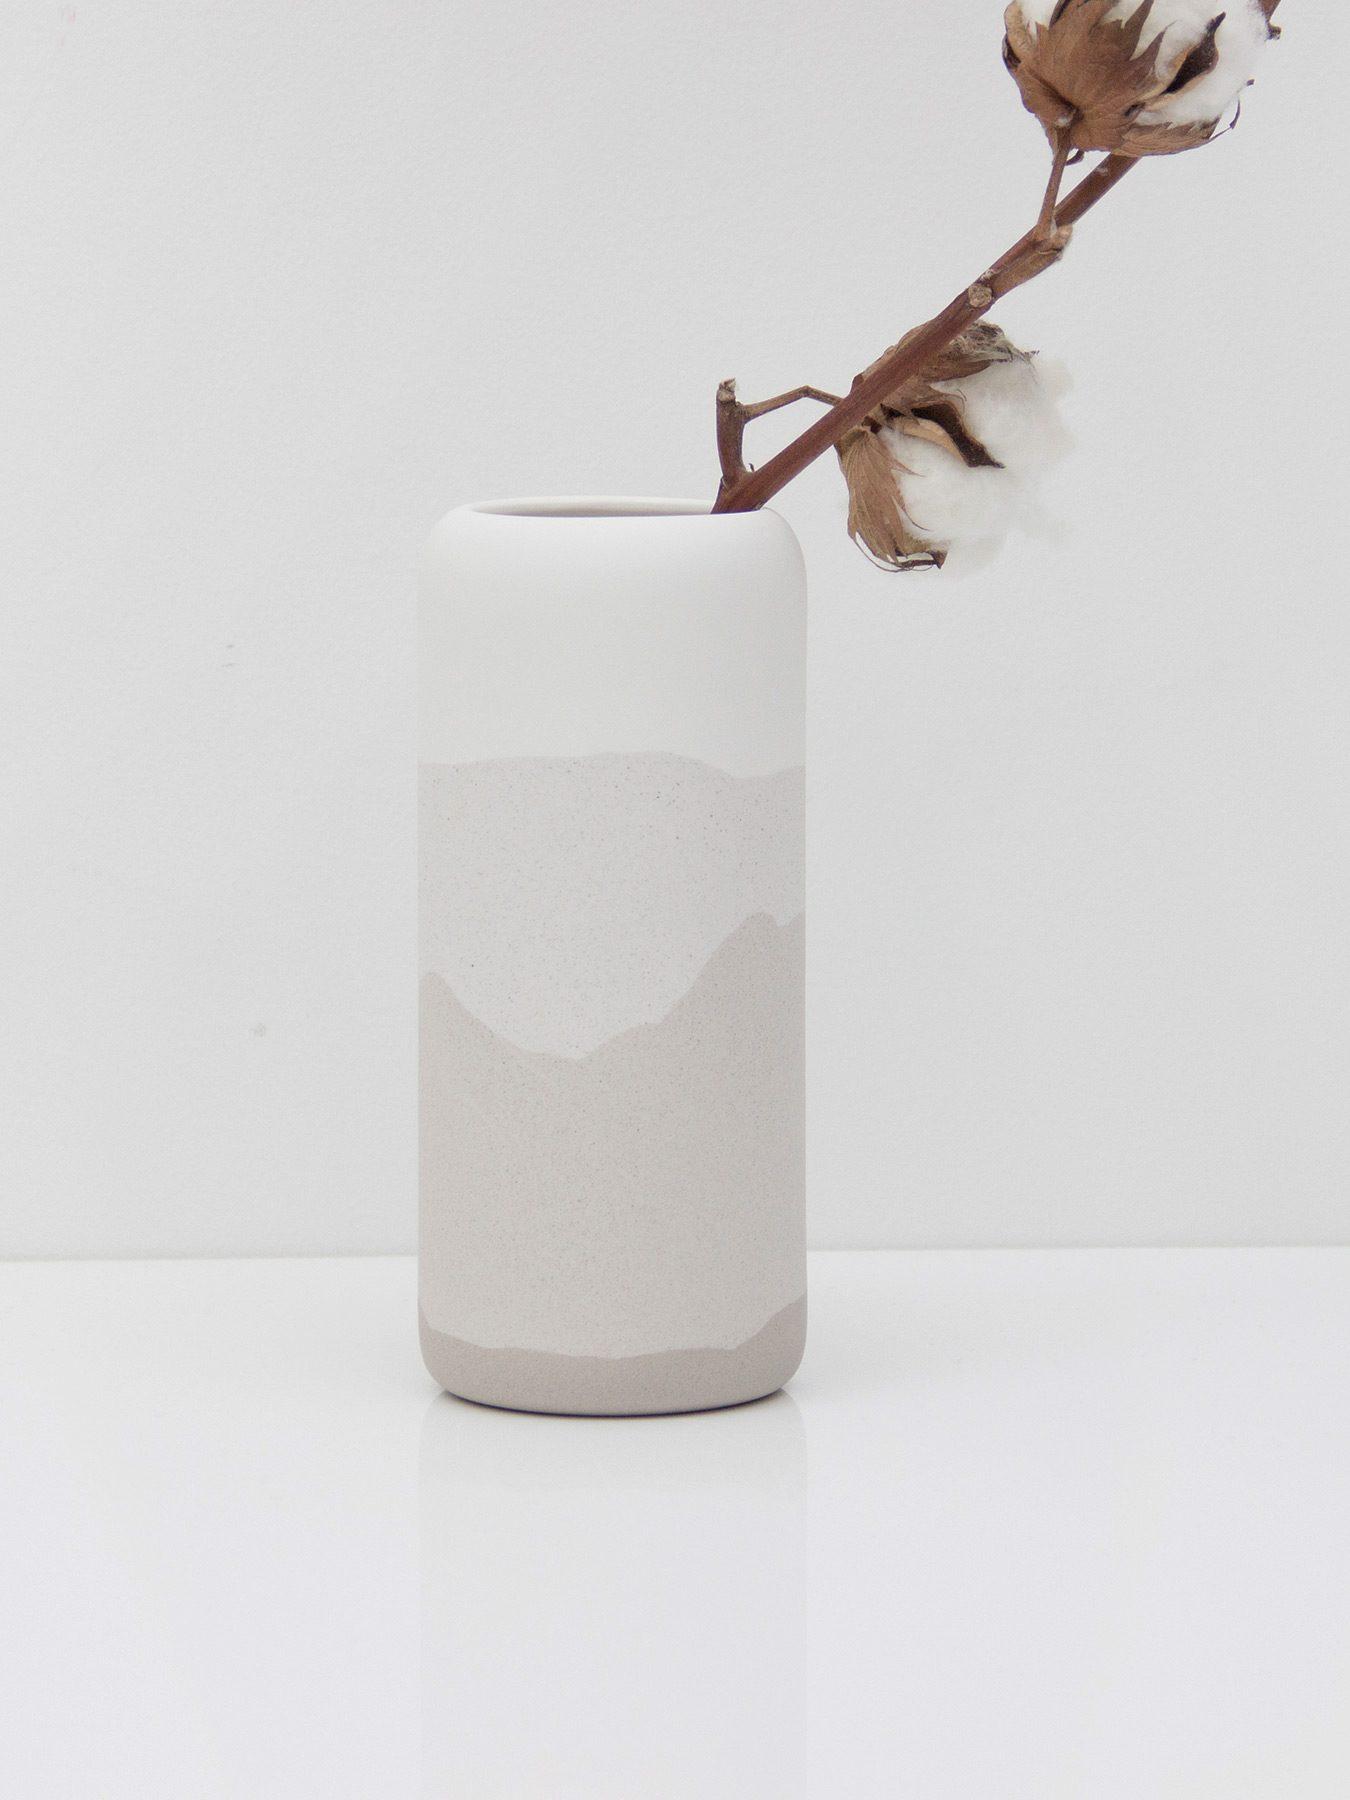 artisan ceramic pottery vase